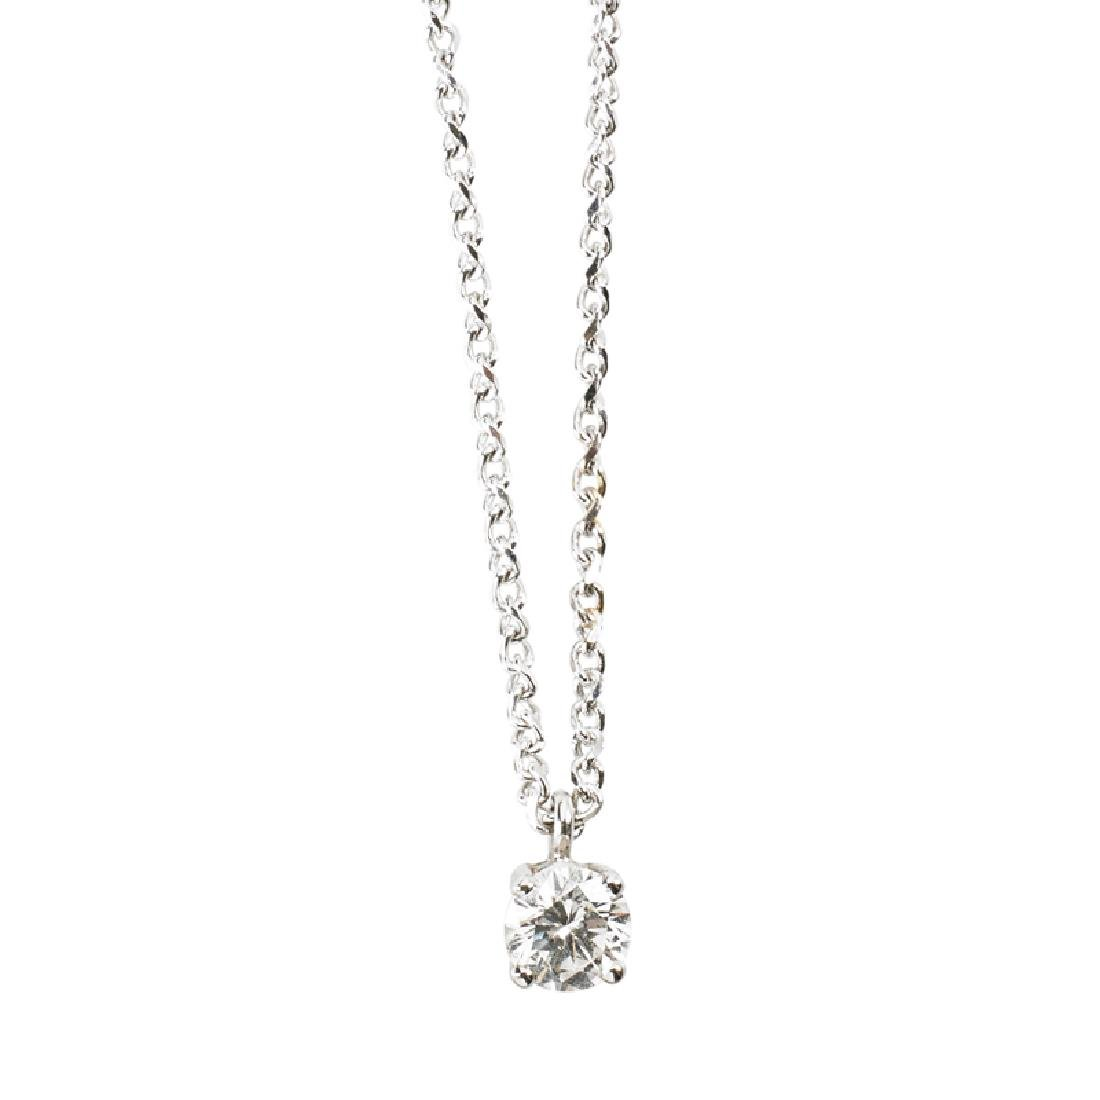 DIAMOND & WHITE GOLD PENDANT NECKLACE